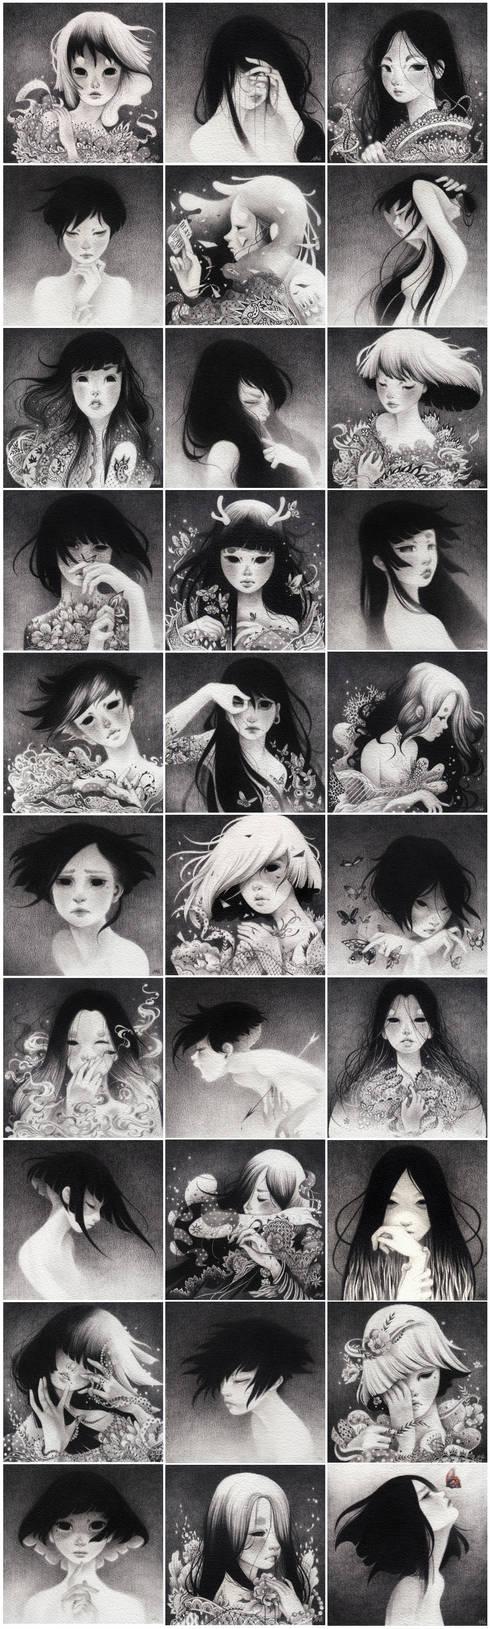 Innocent Girls III